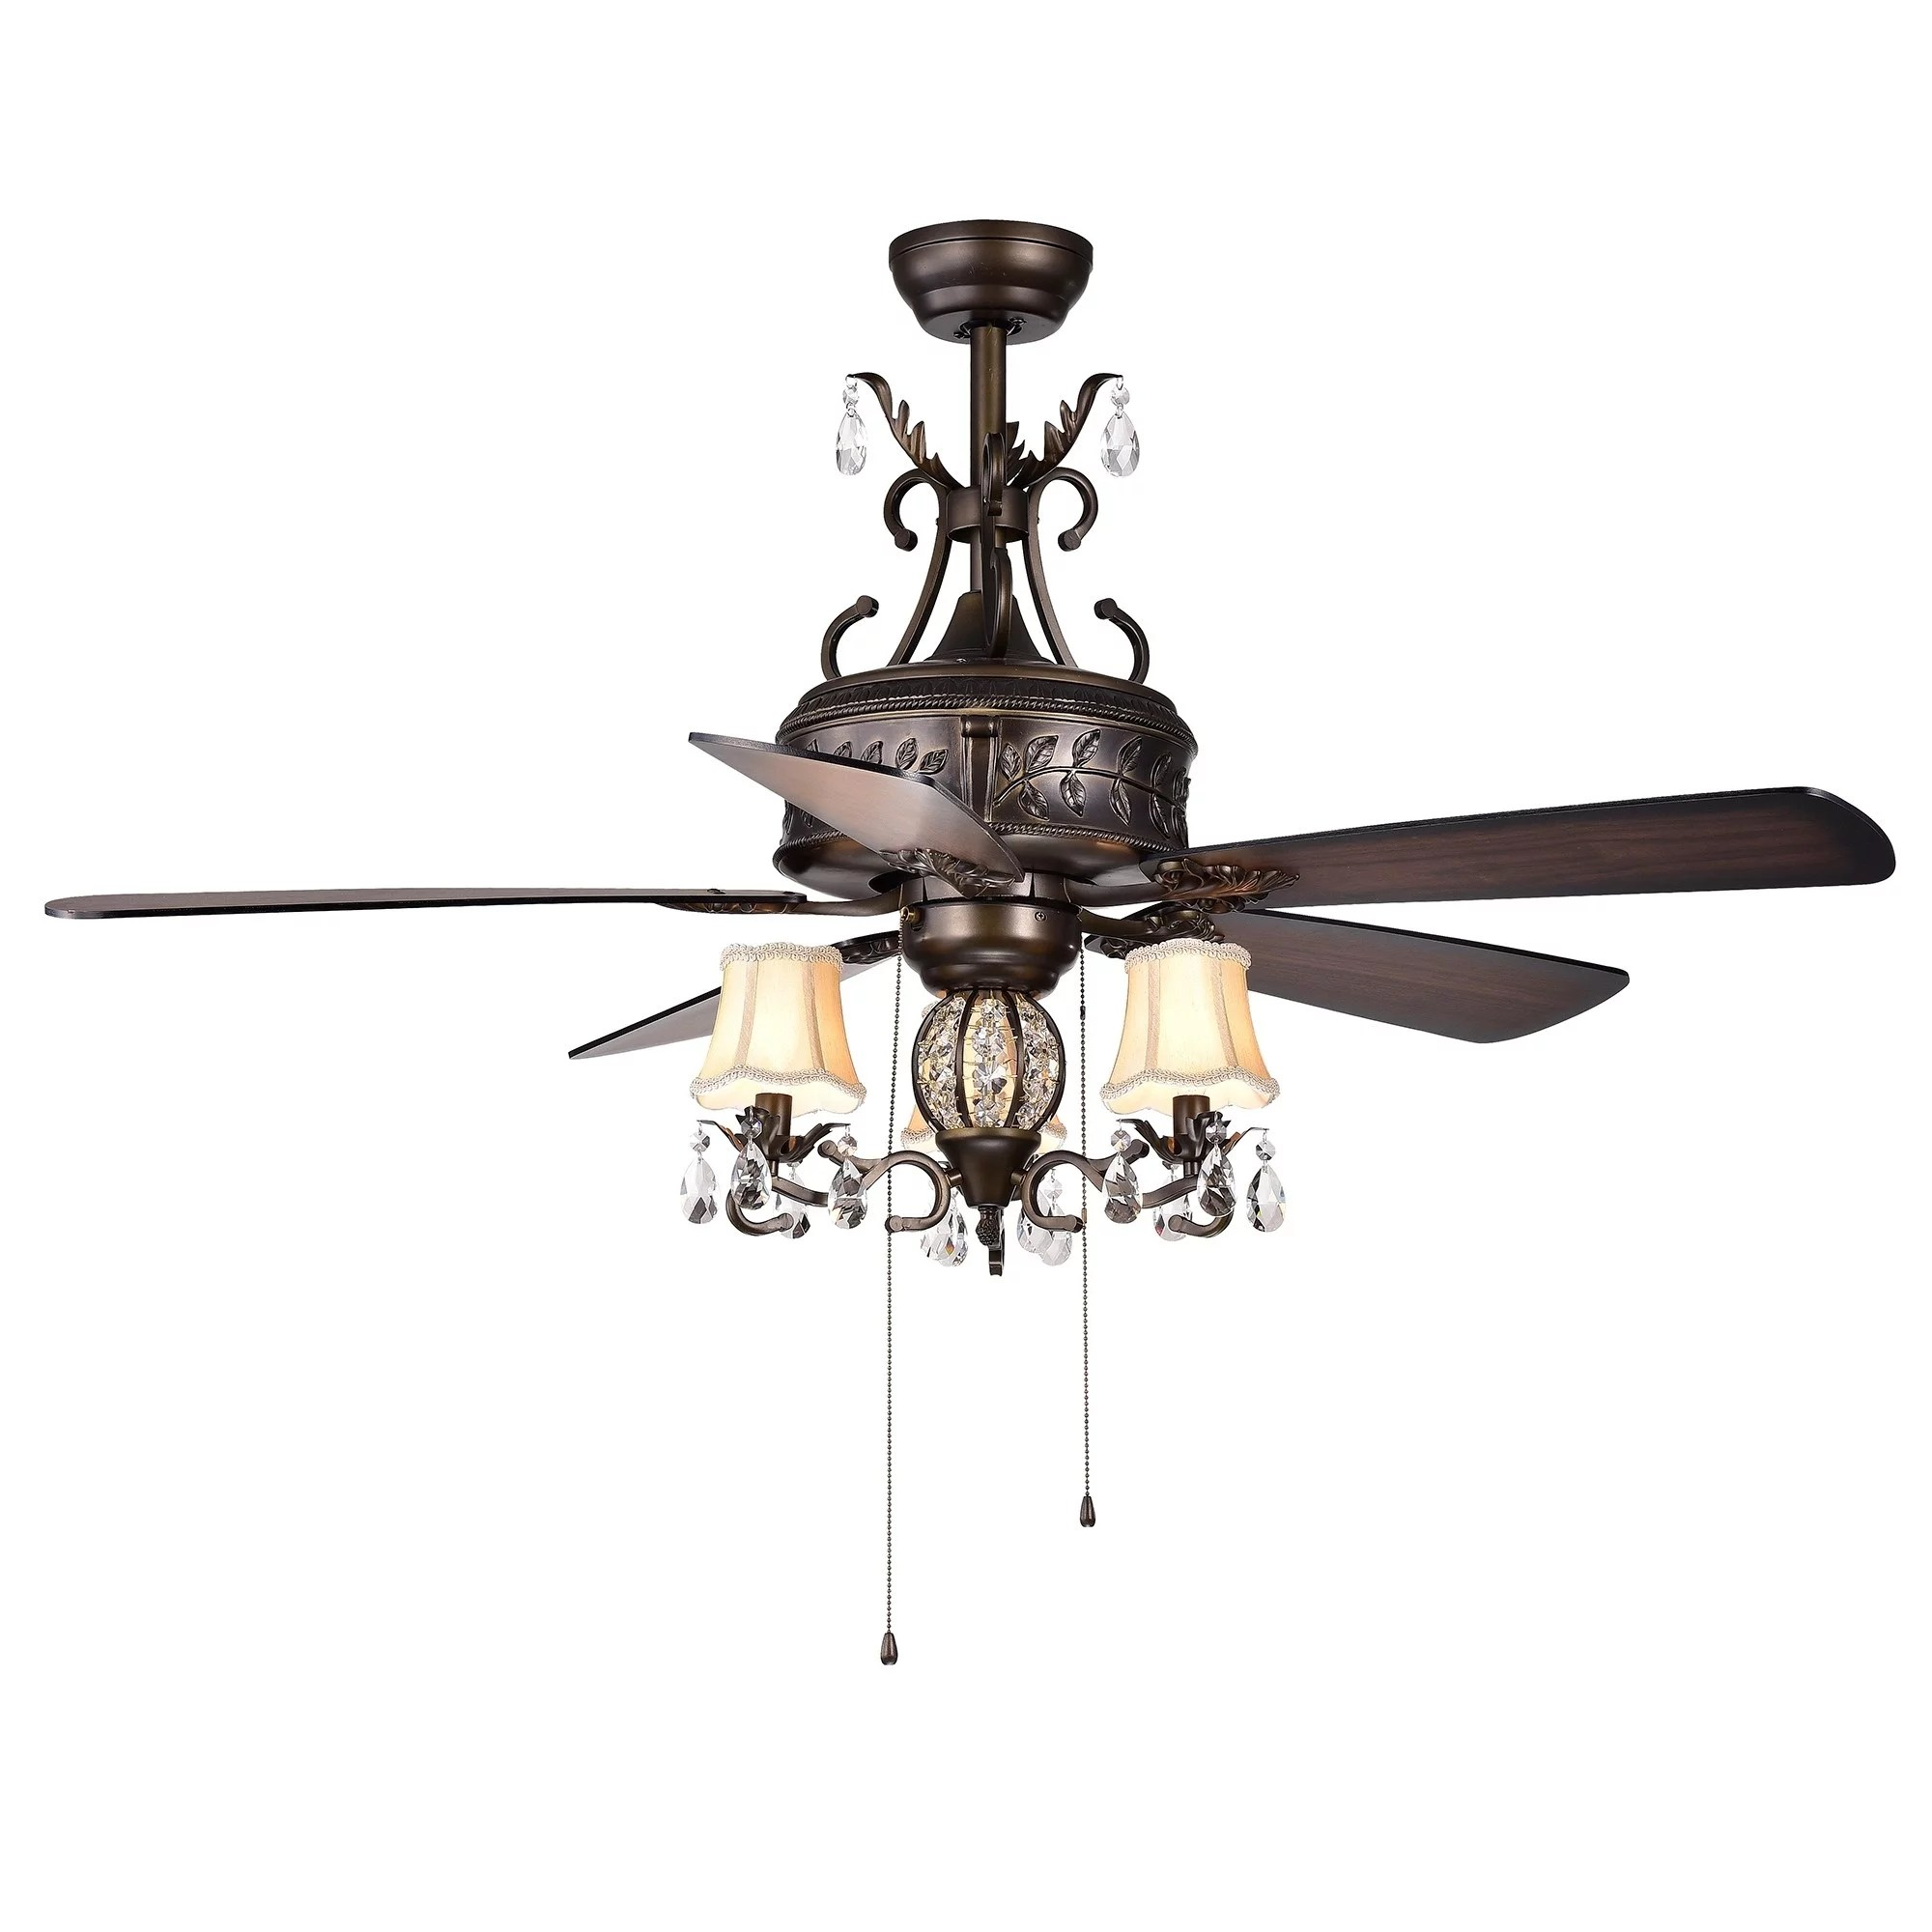 Firtha 5 Blade Antique Style 3 Light 52 Inch Ceiling Fan Walmart Com Walmart Com